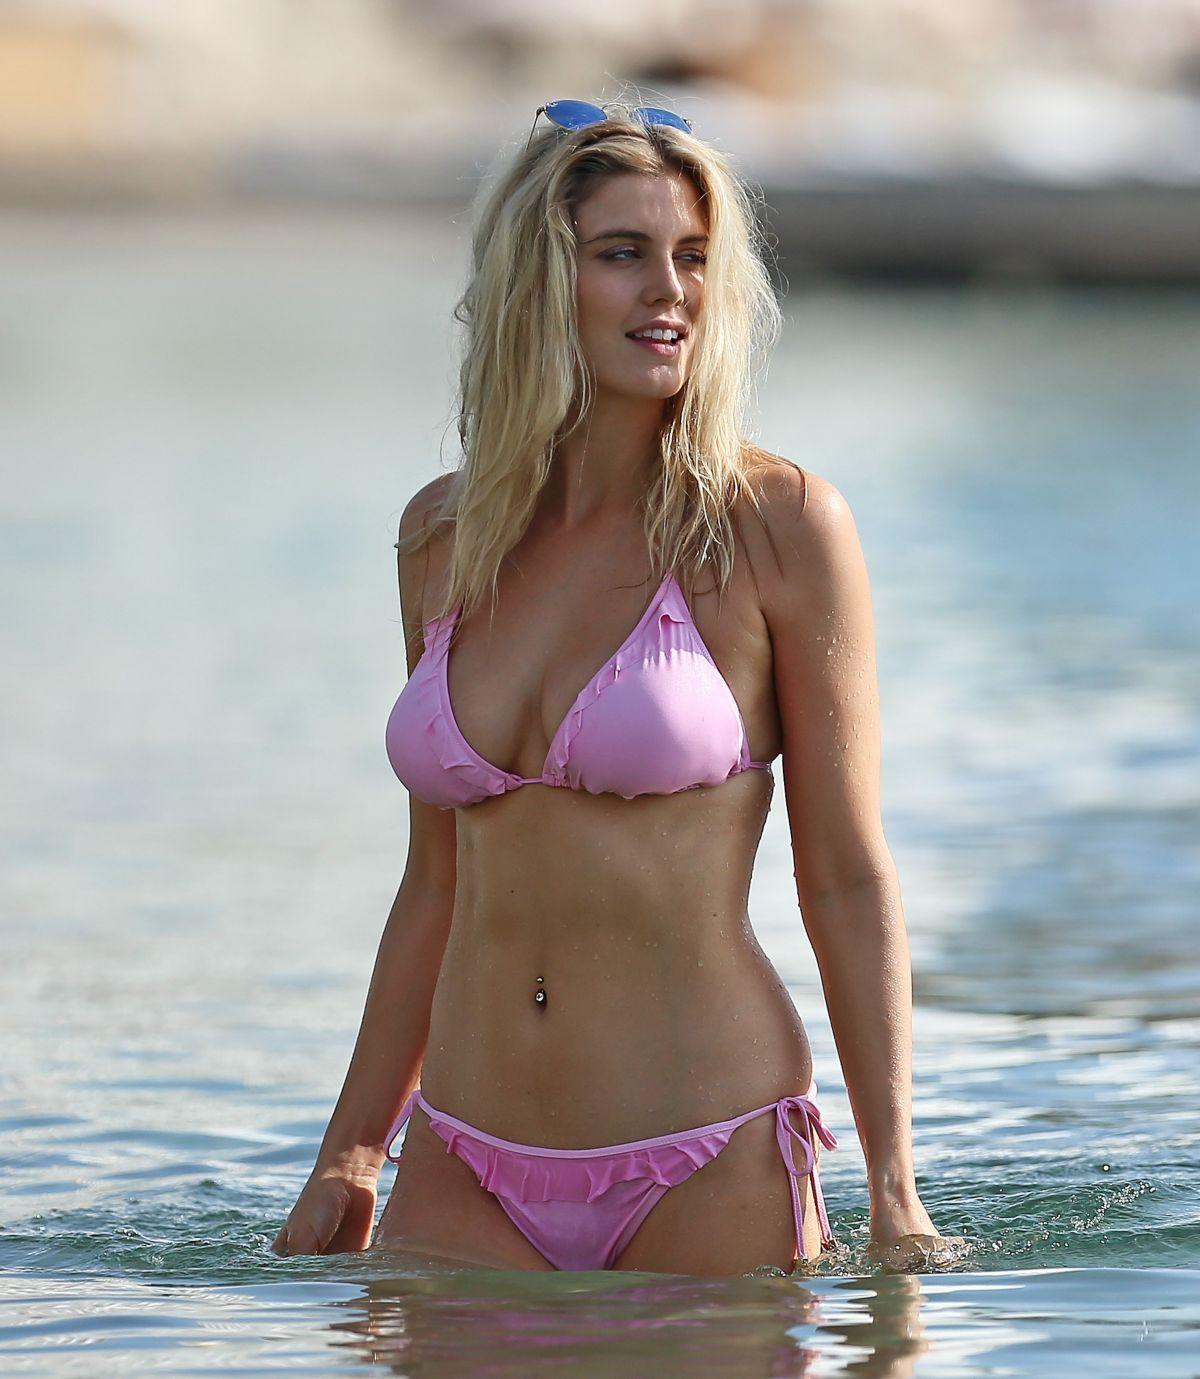 Bikini Natalie Alyn Lind nude photos 2019